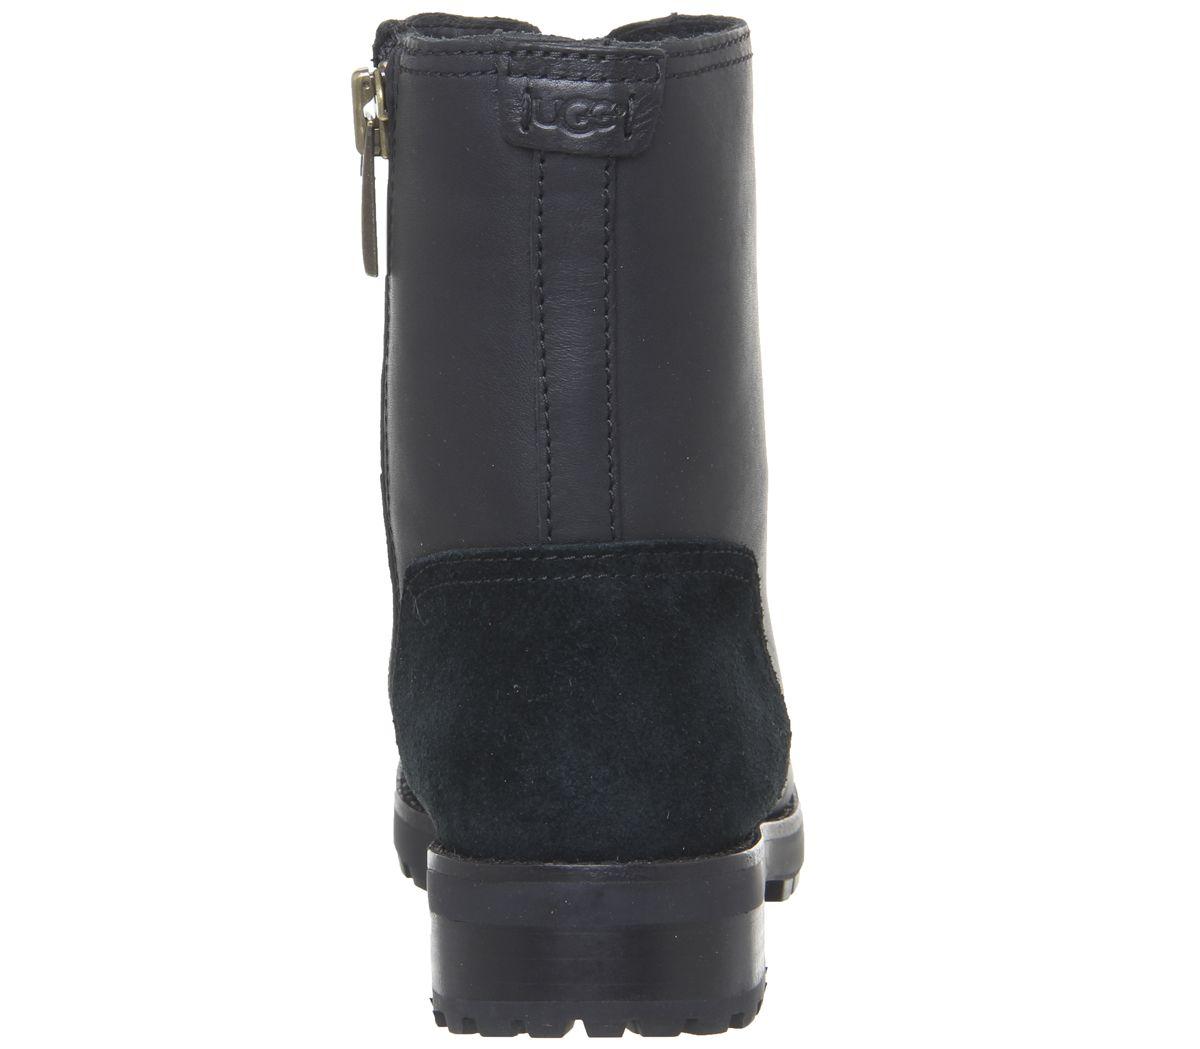 c2e8e8251b5 Kilmer Exposed Fur Boots